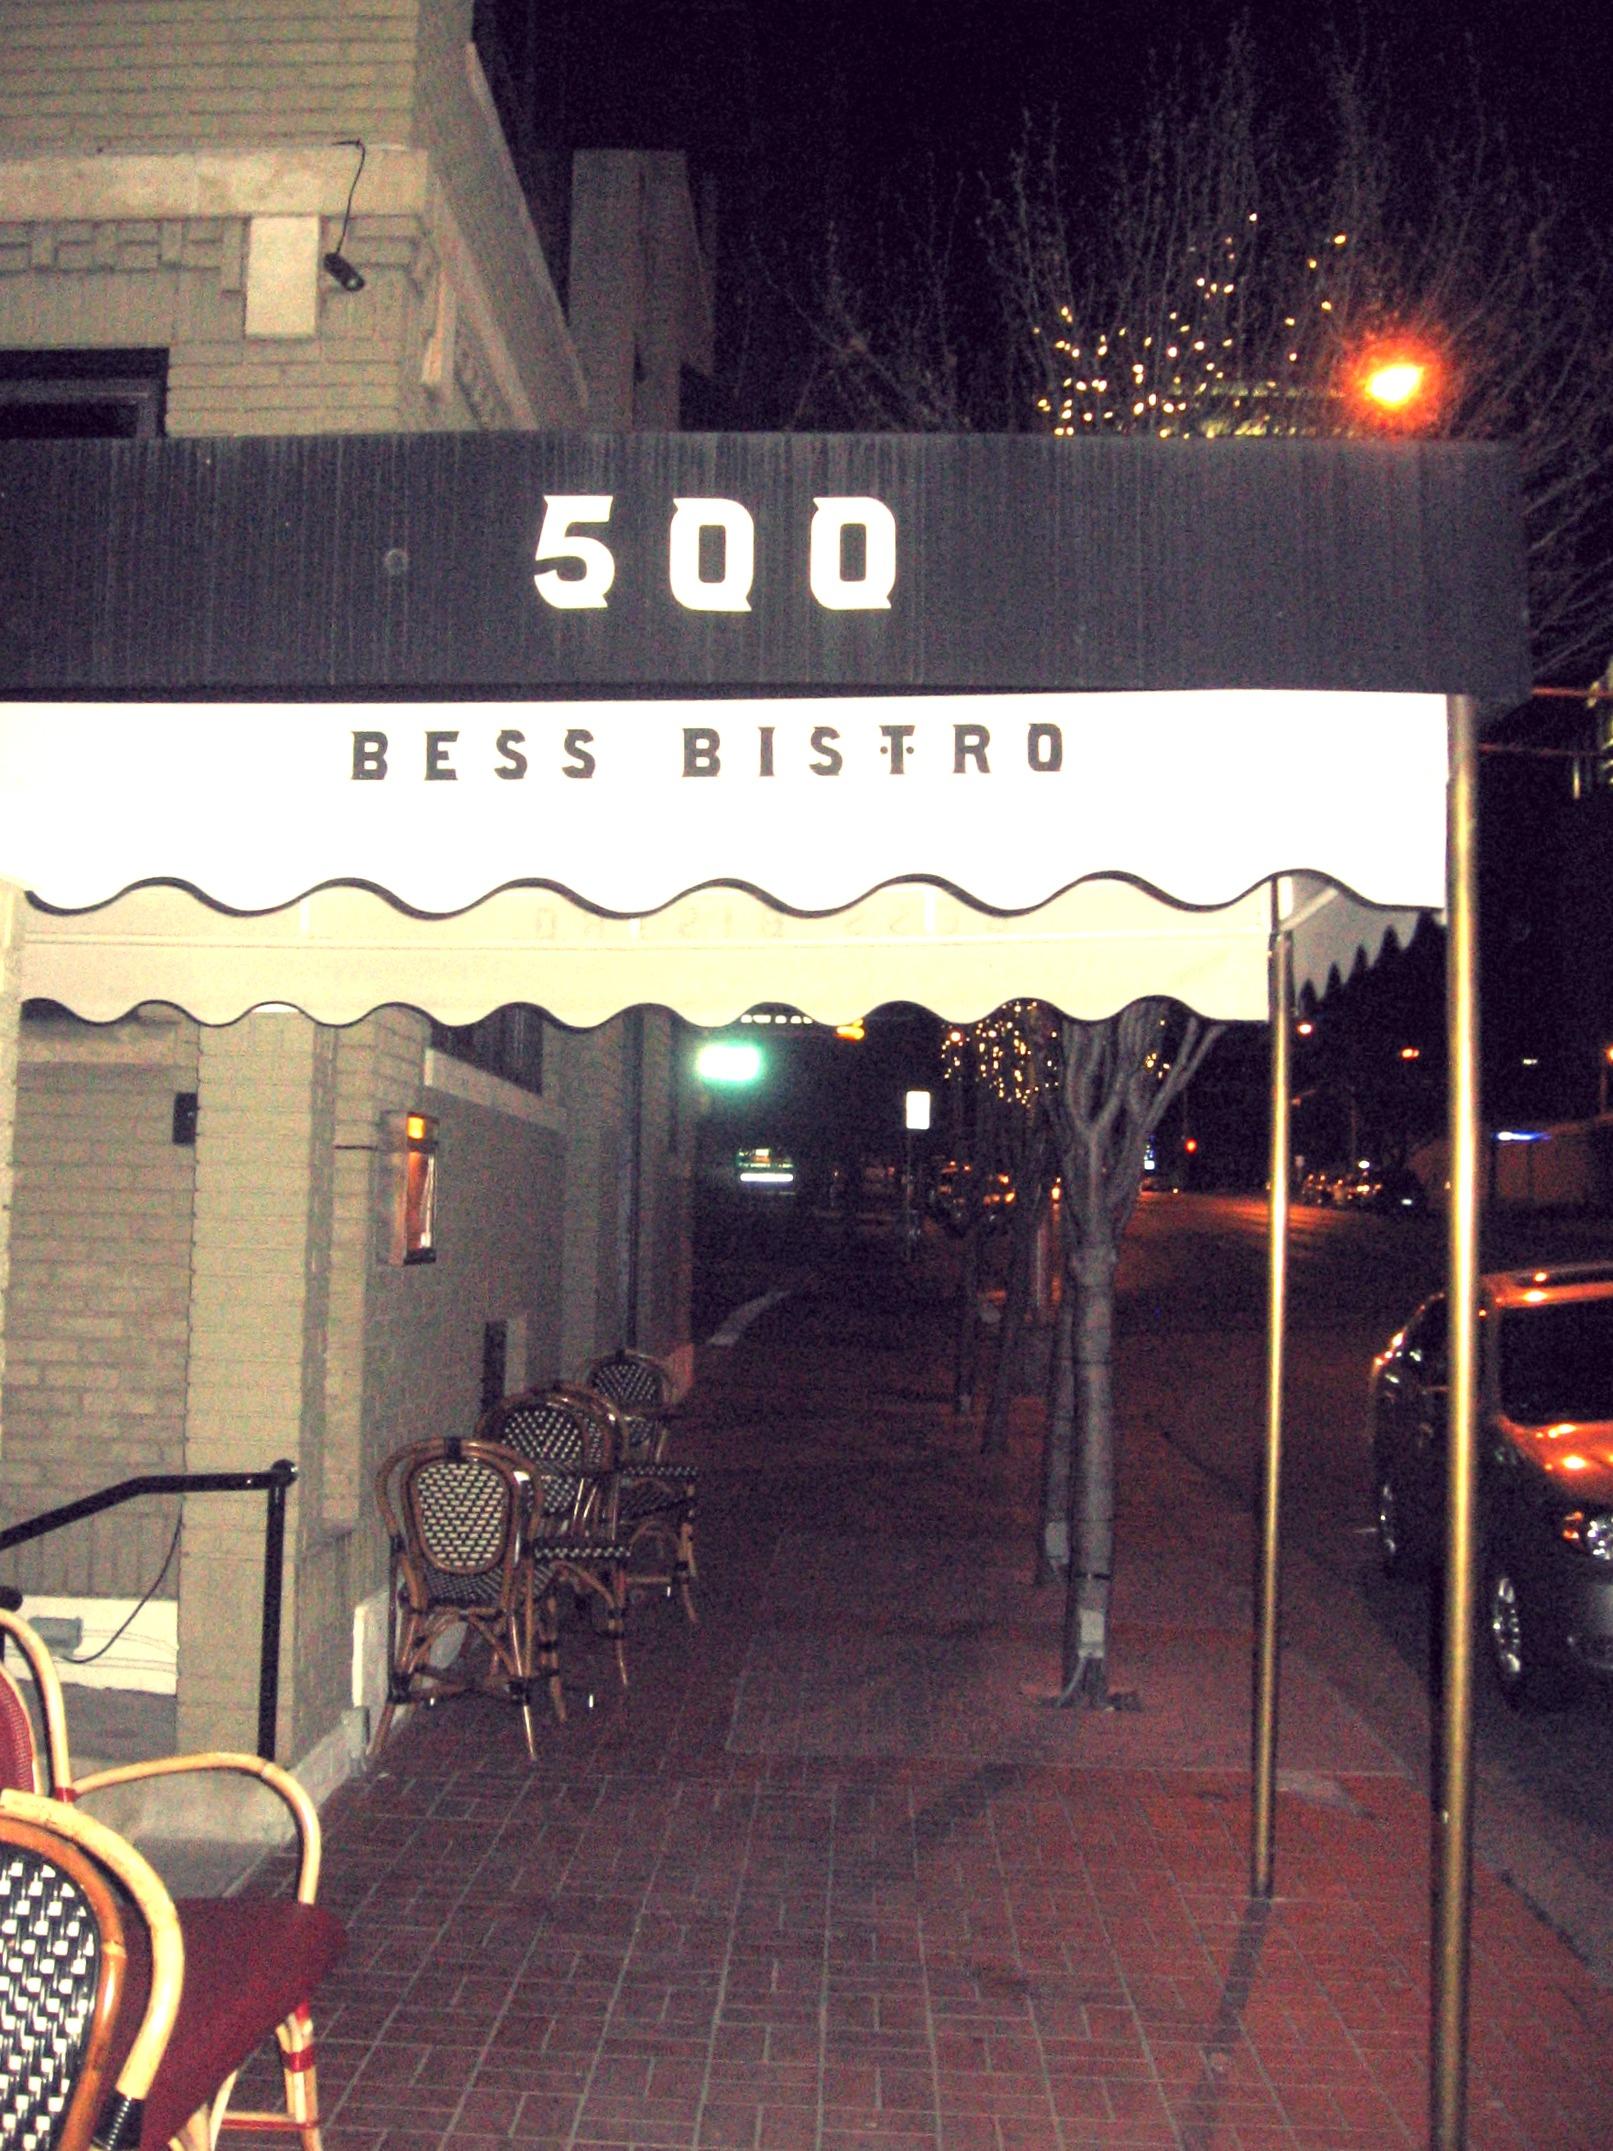 Bess Bistro, Sandra Bullock's restaurant in Austin, Texas